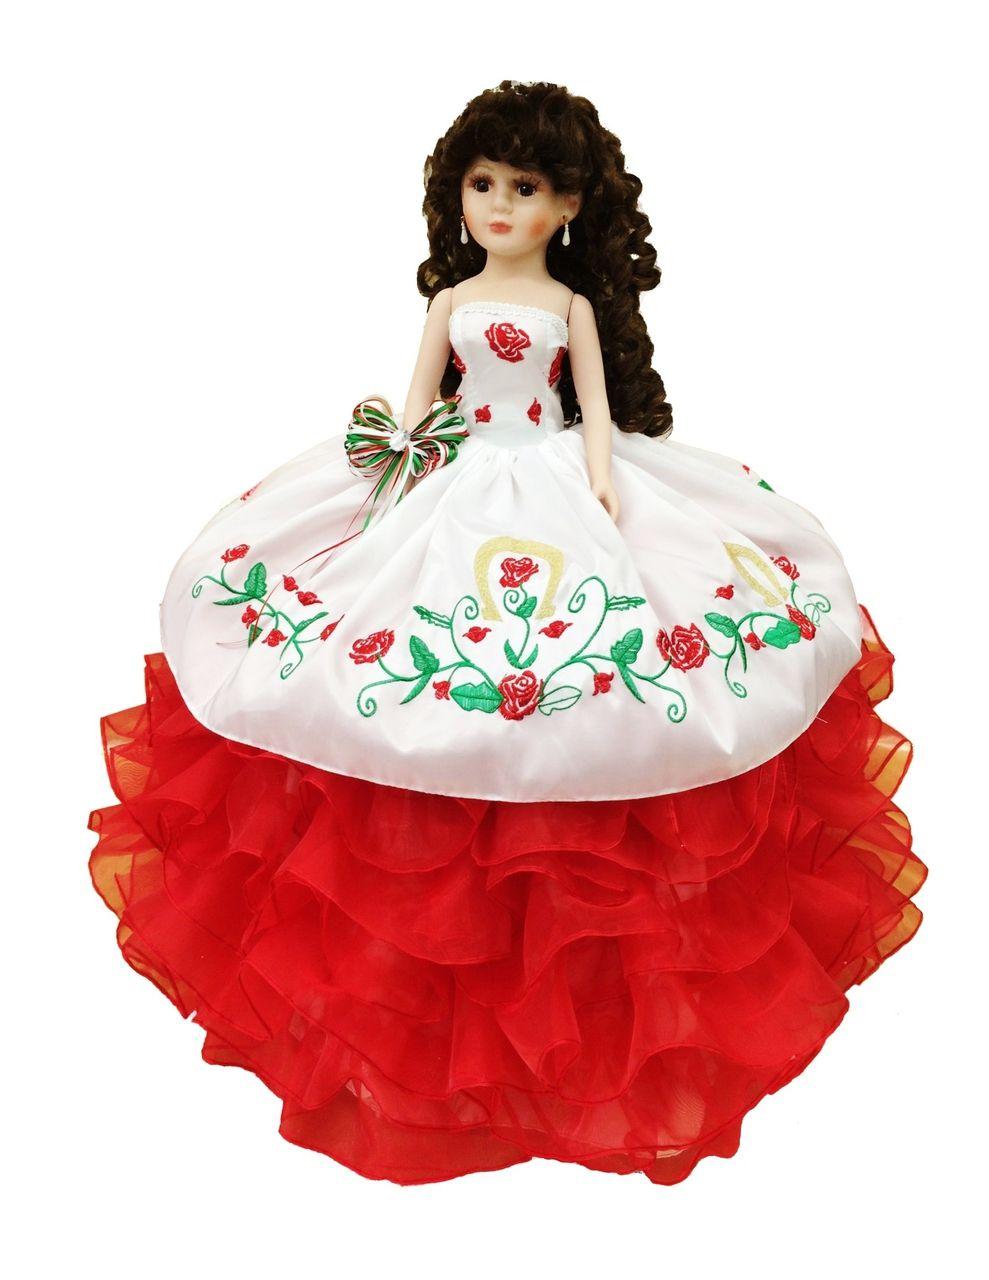 21bca5034c0 Find quinceanera charra dolls and muneca para quinceanera in custom colors.  Zebra and Precious Moments quinceanera dolls here